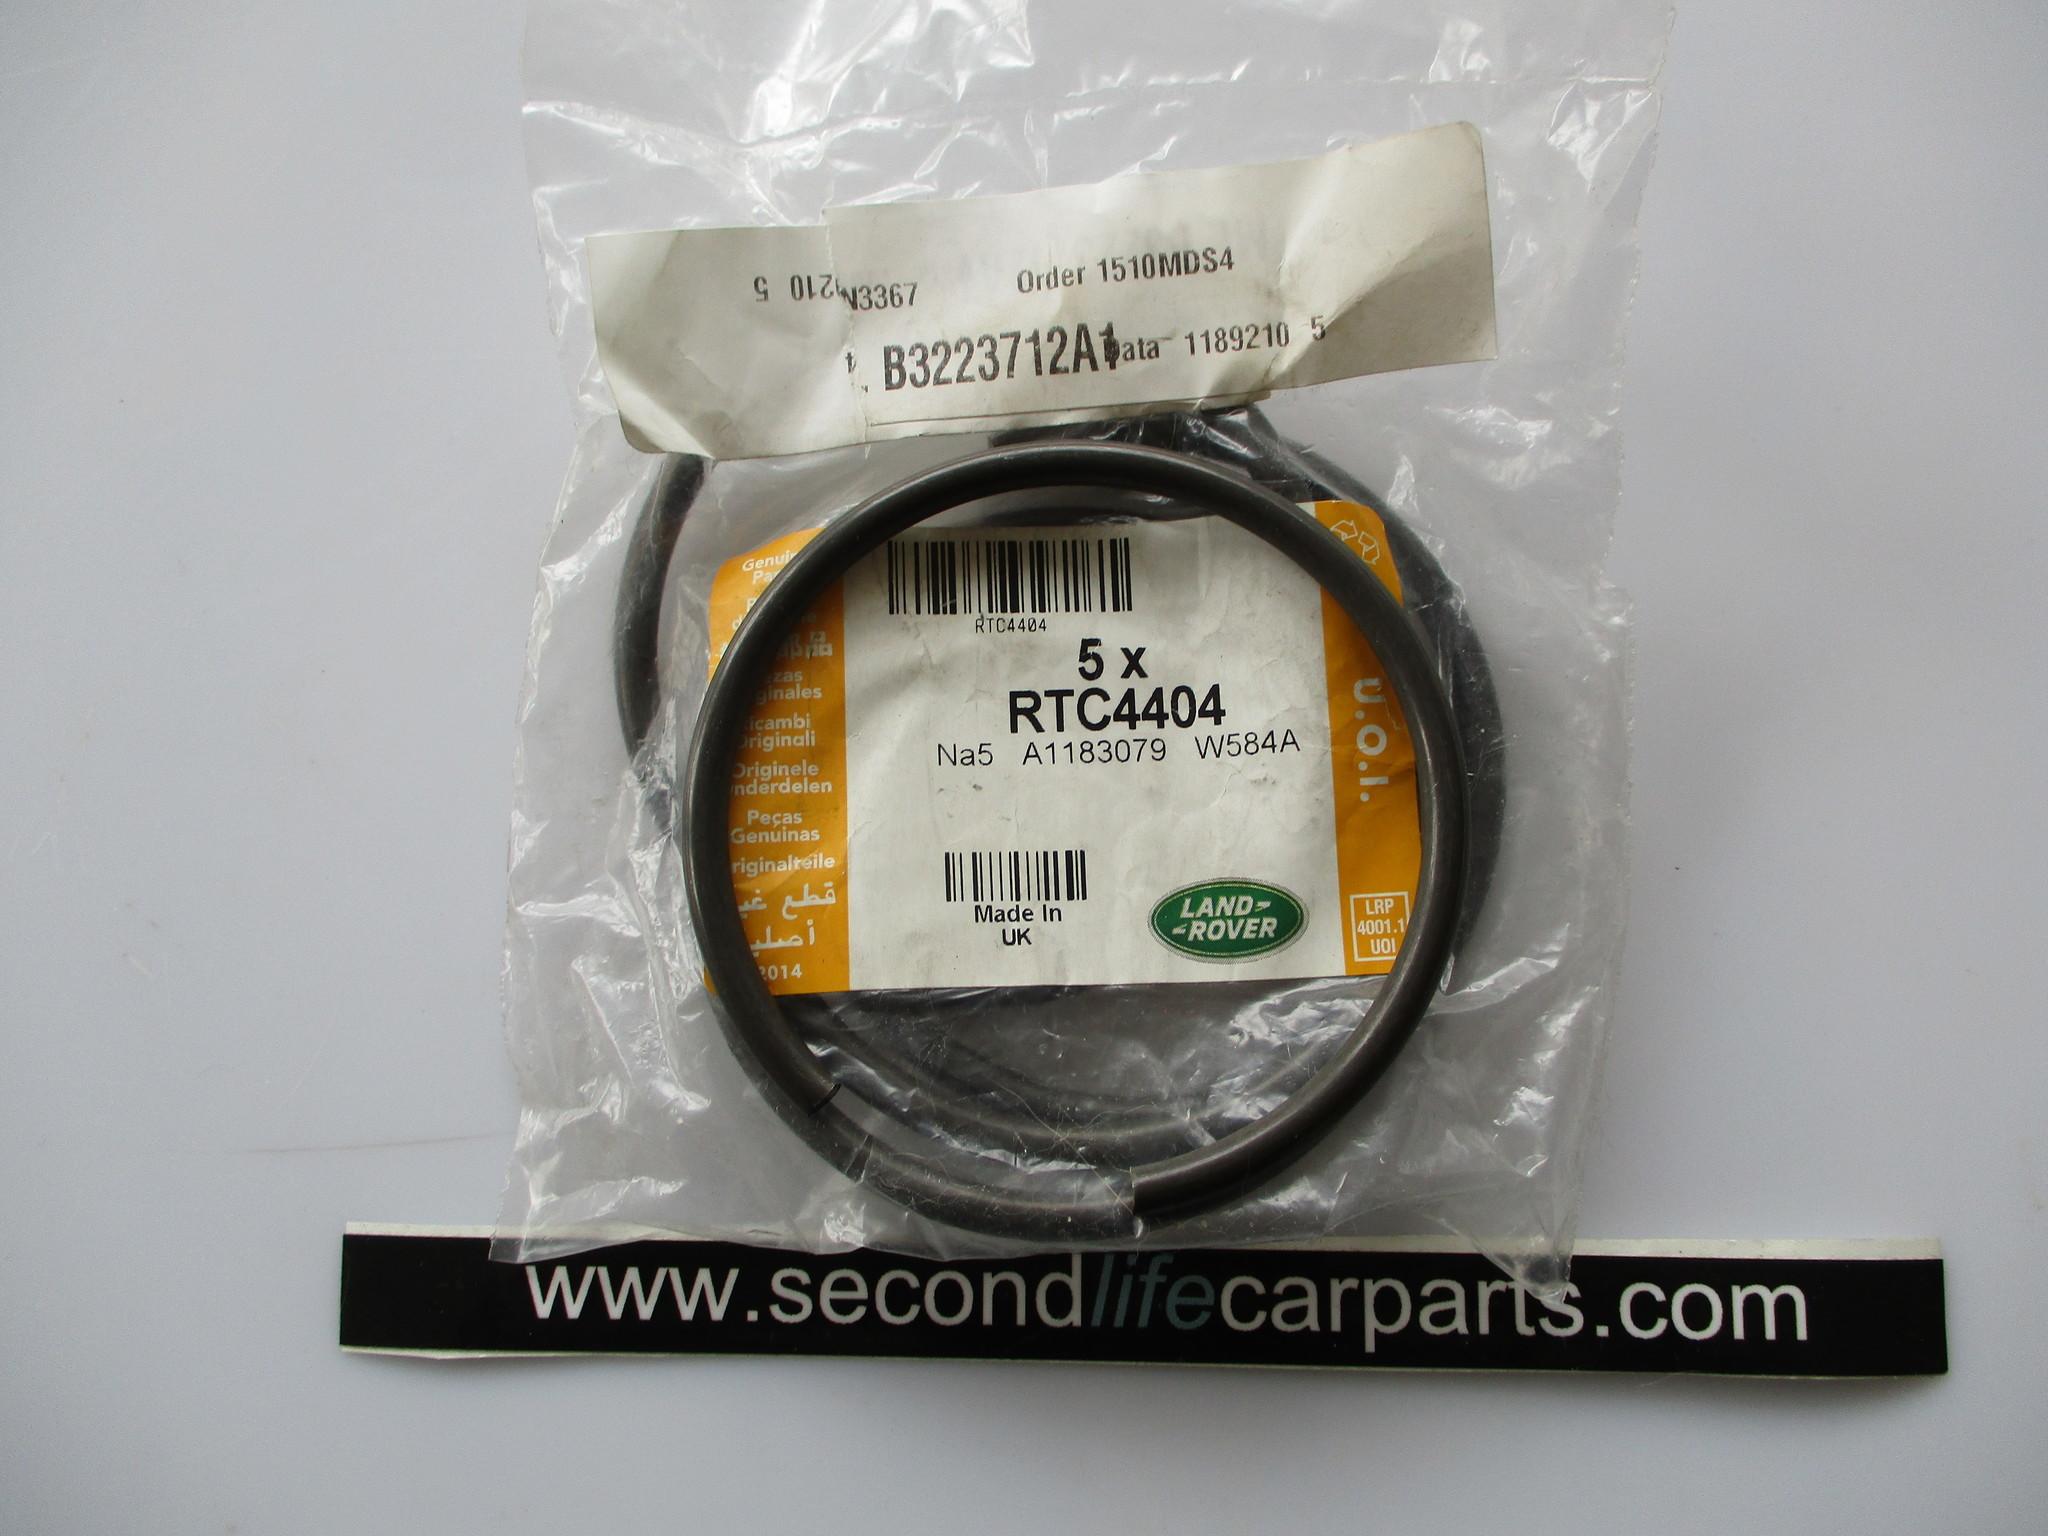 RING STUURBEKRACHTING RTC4404